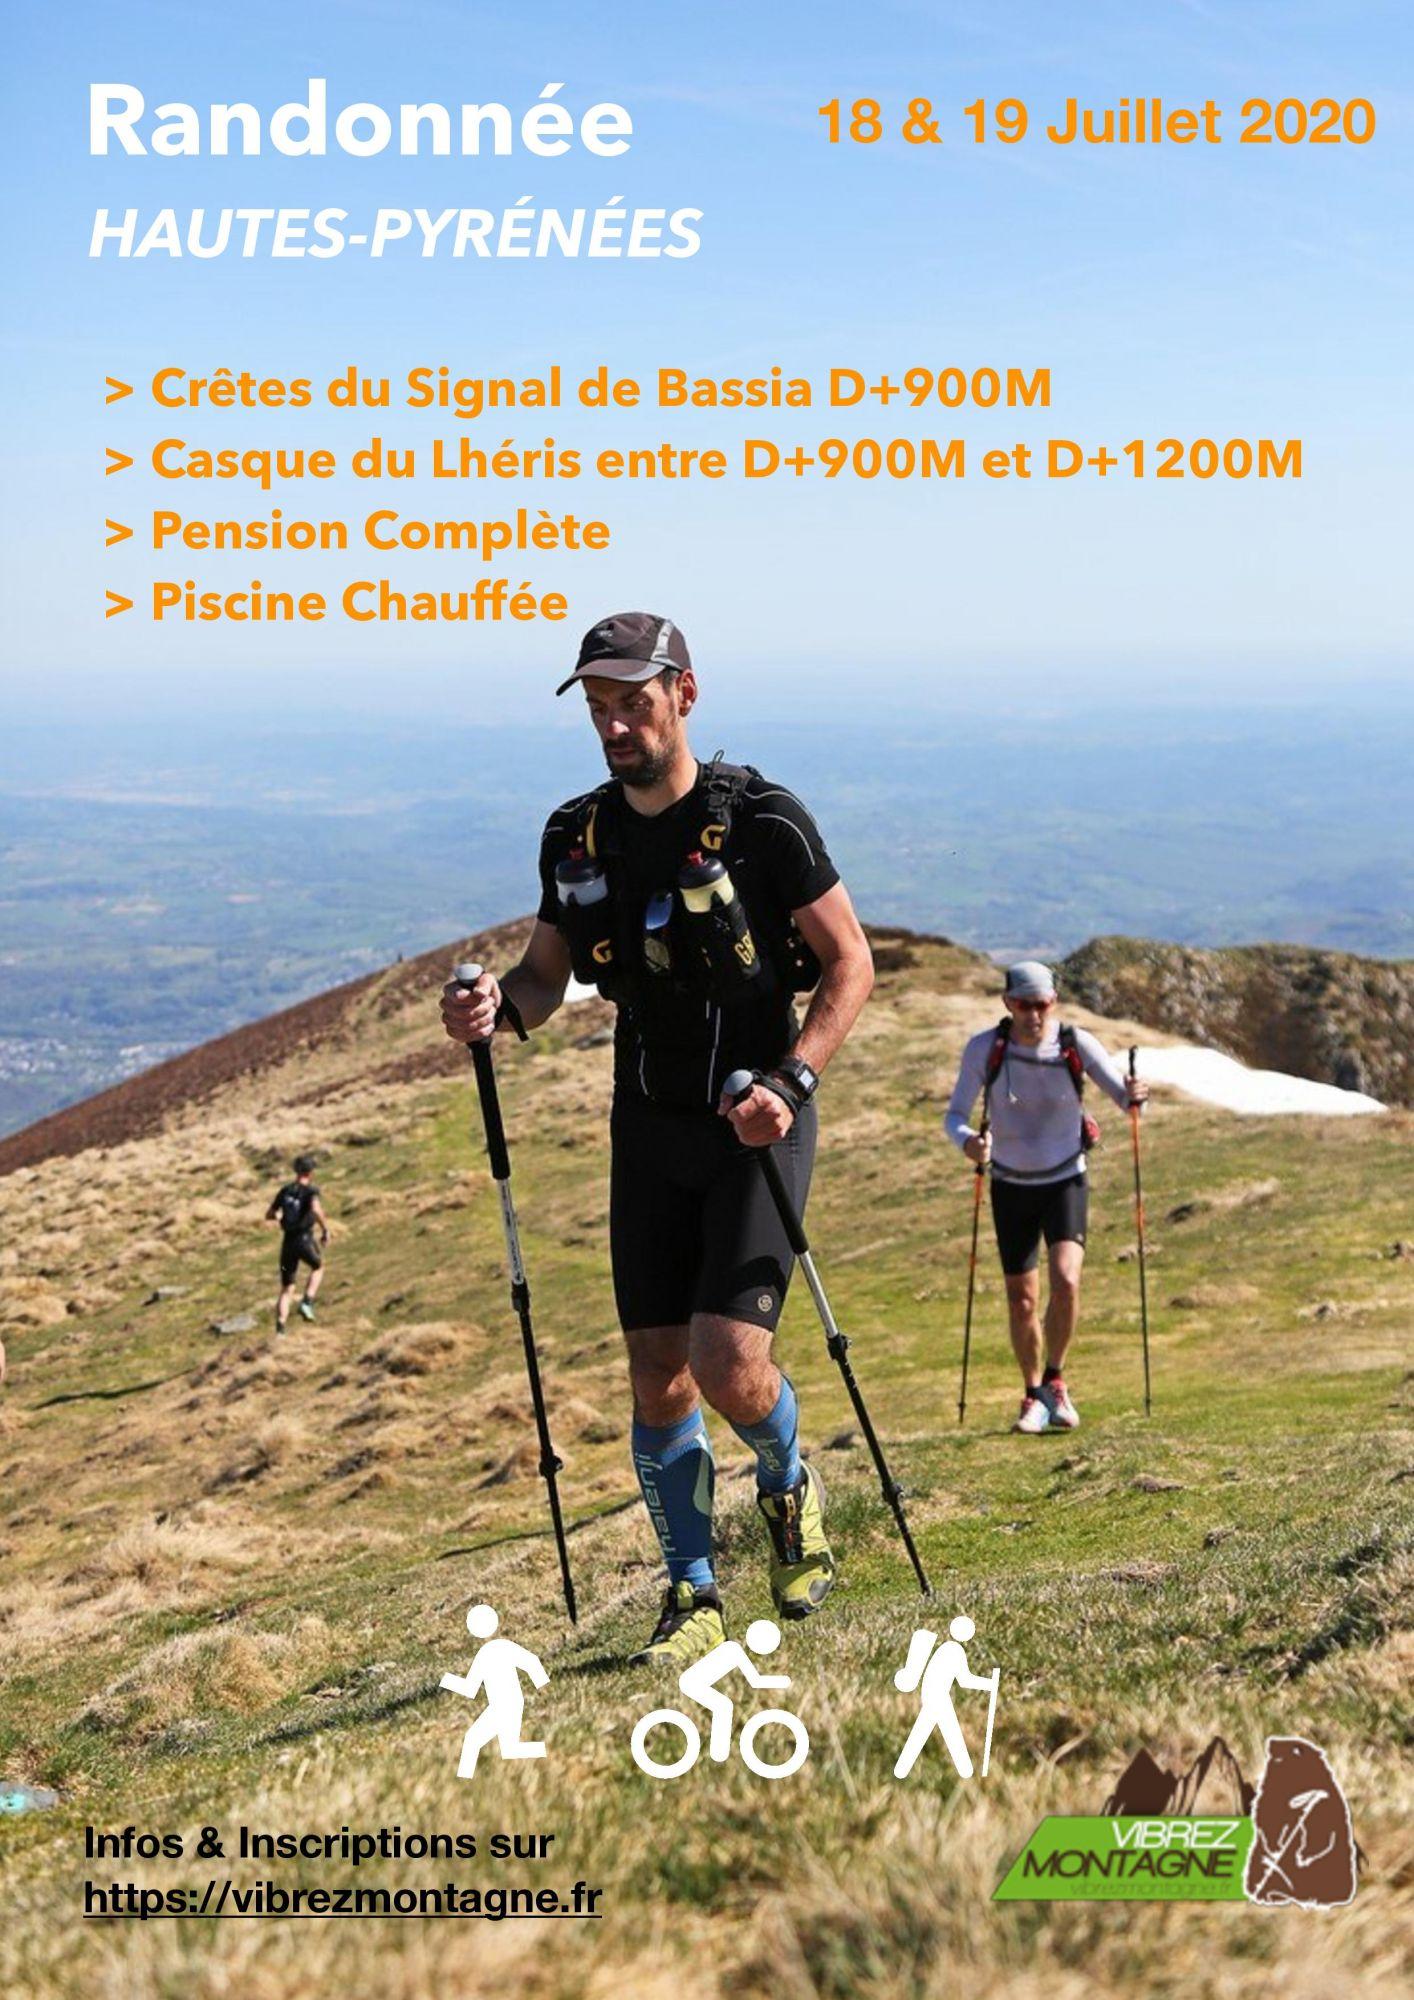 rando-18-19-juillet-vibrez-montagne